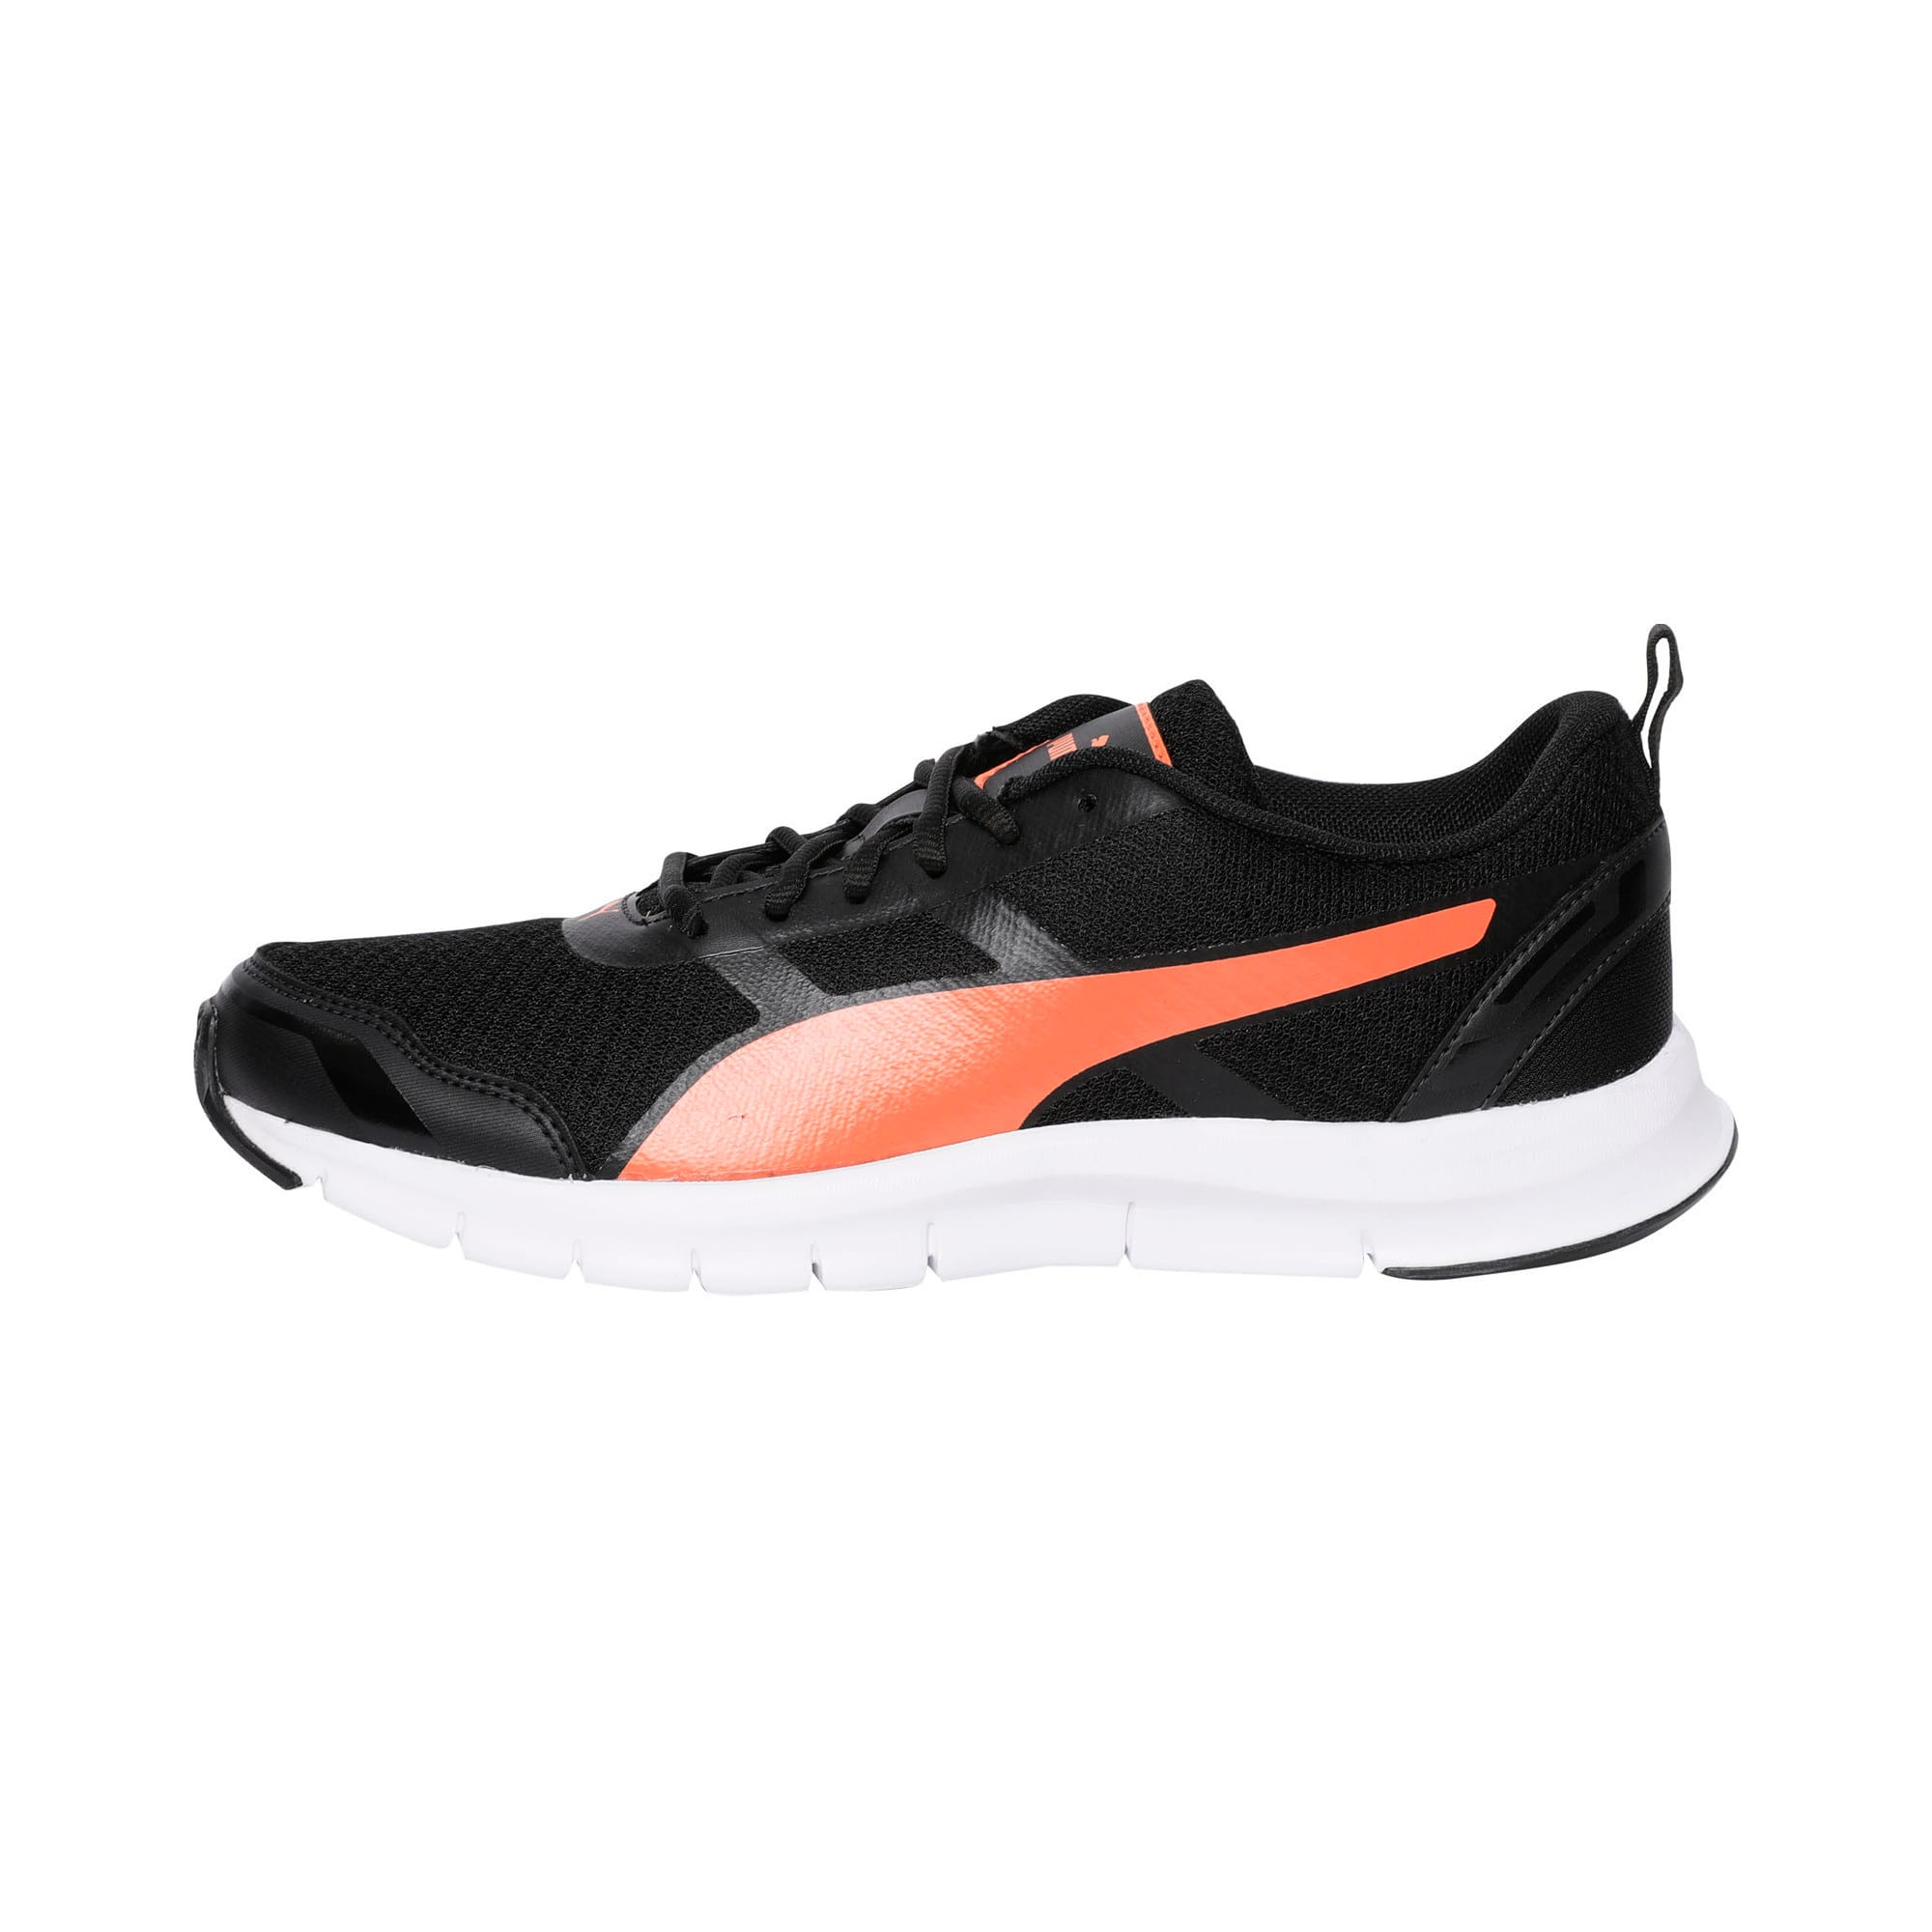 Thumbnail 1 of Track V2 IDP Puma Black-Limepunch-Puma W, Puma Black-Vibrant Orange, medium-IND